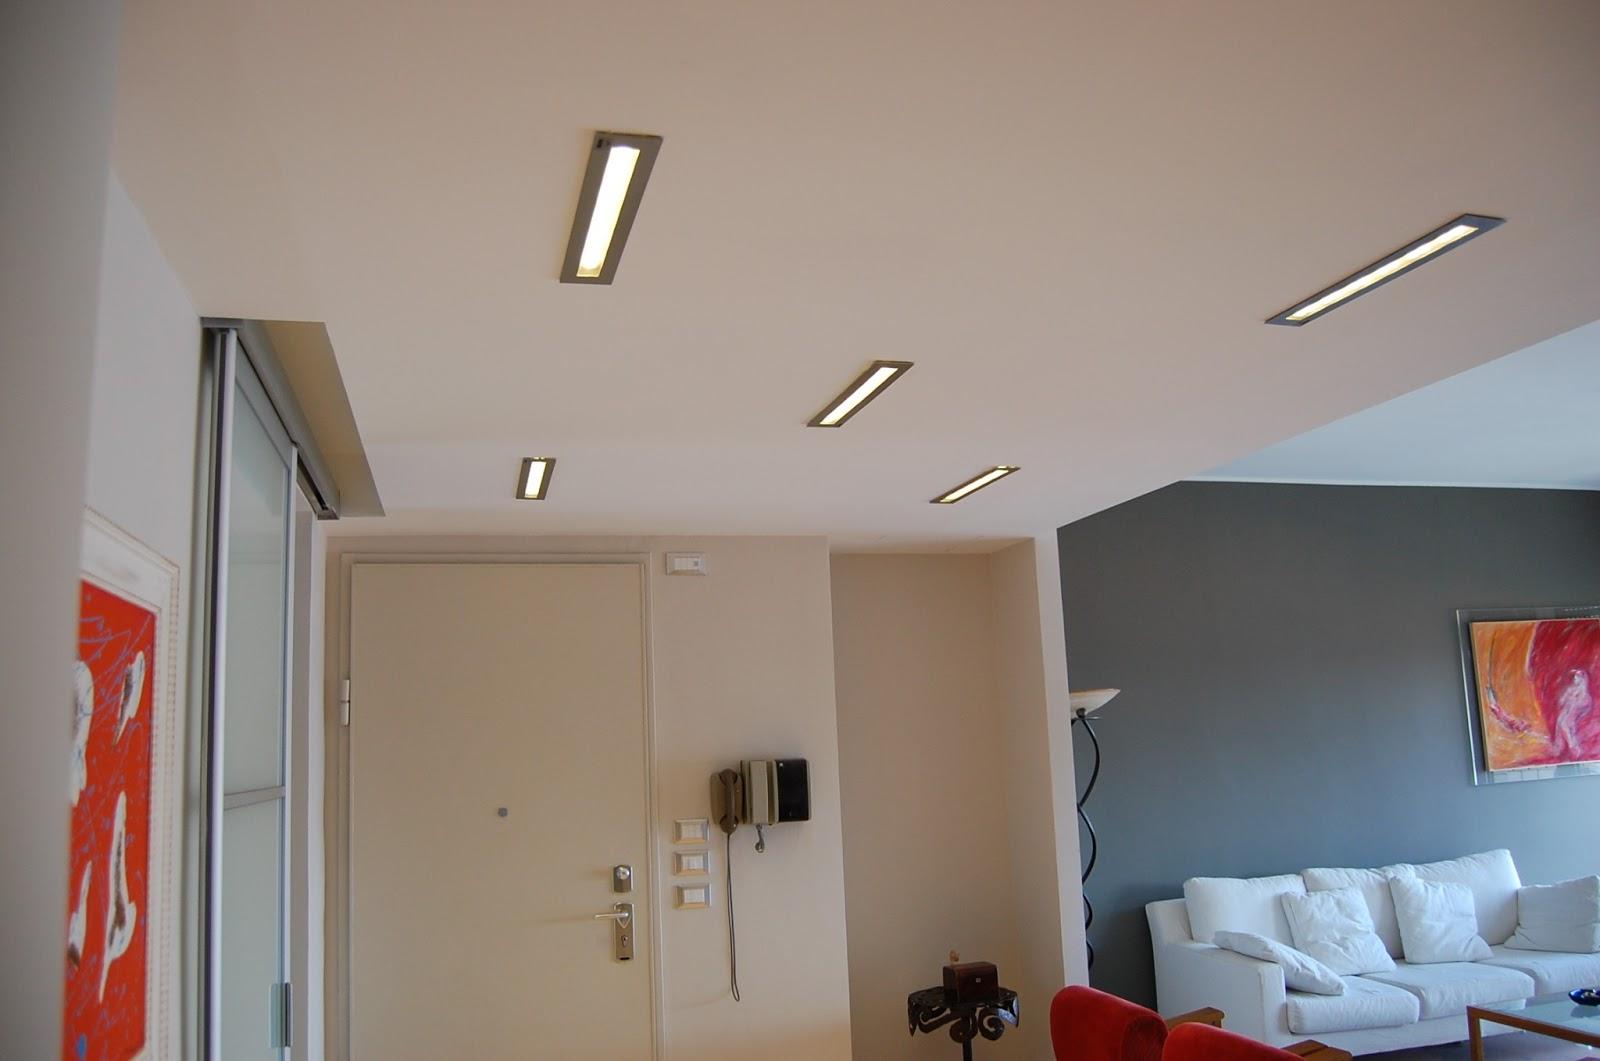 Illuminazione led casa gennaio 2014 - Luci di emergenza per casa ...